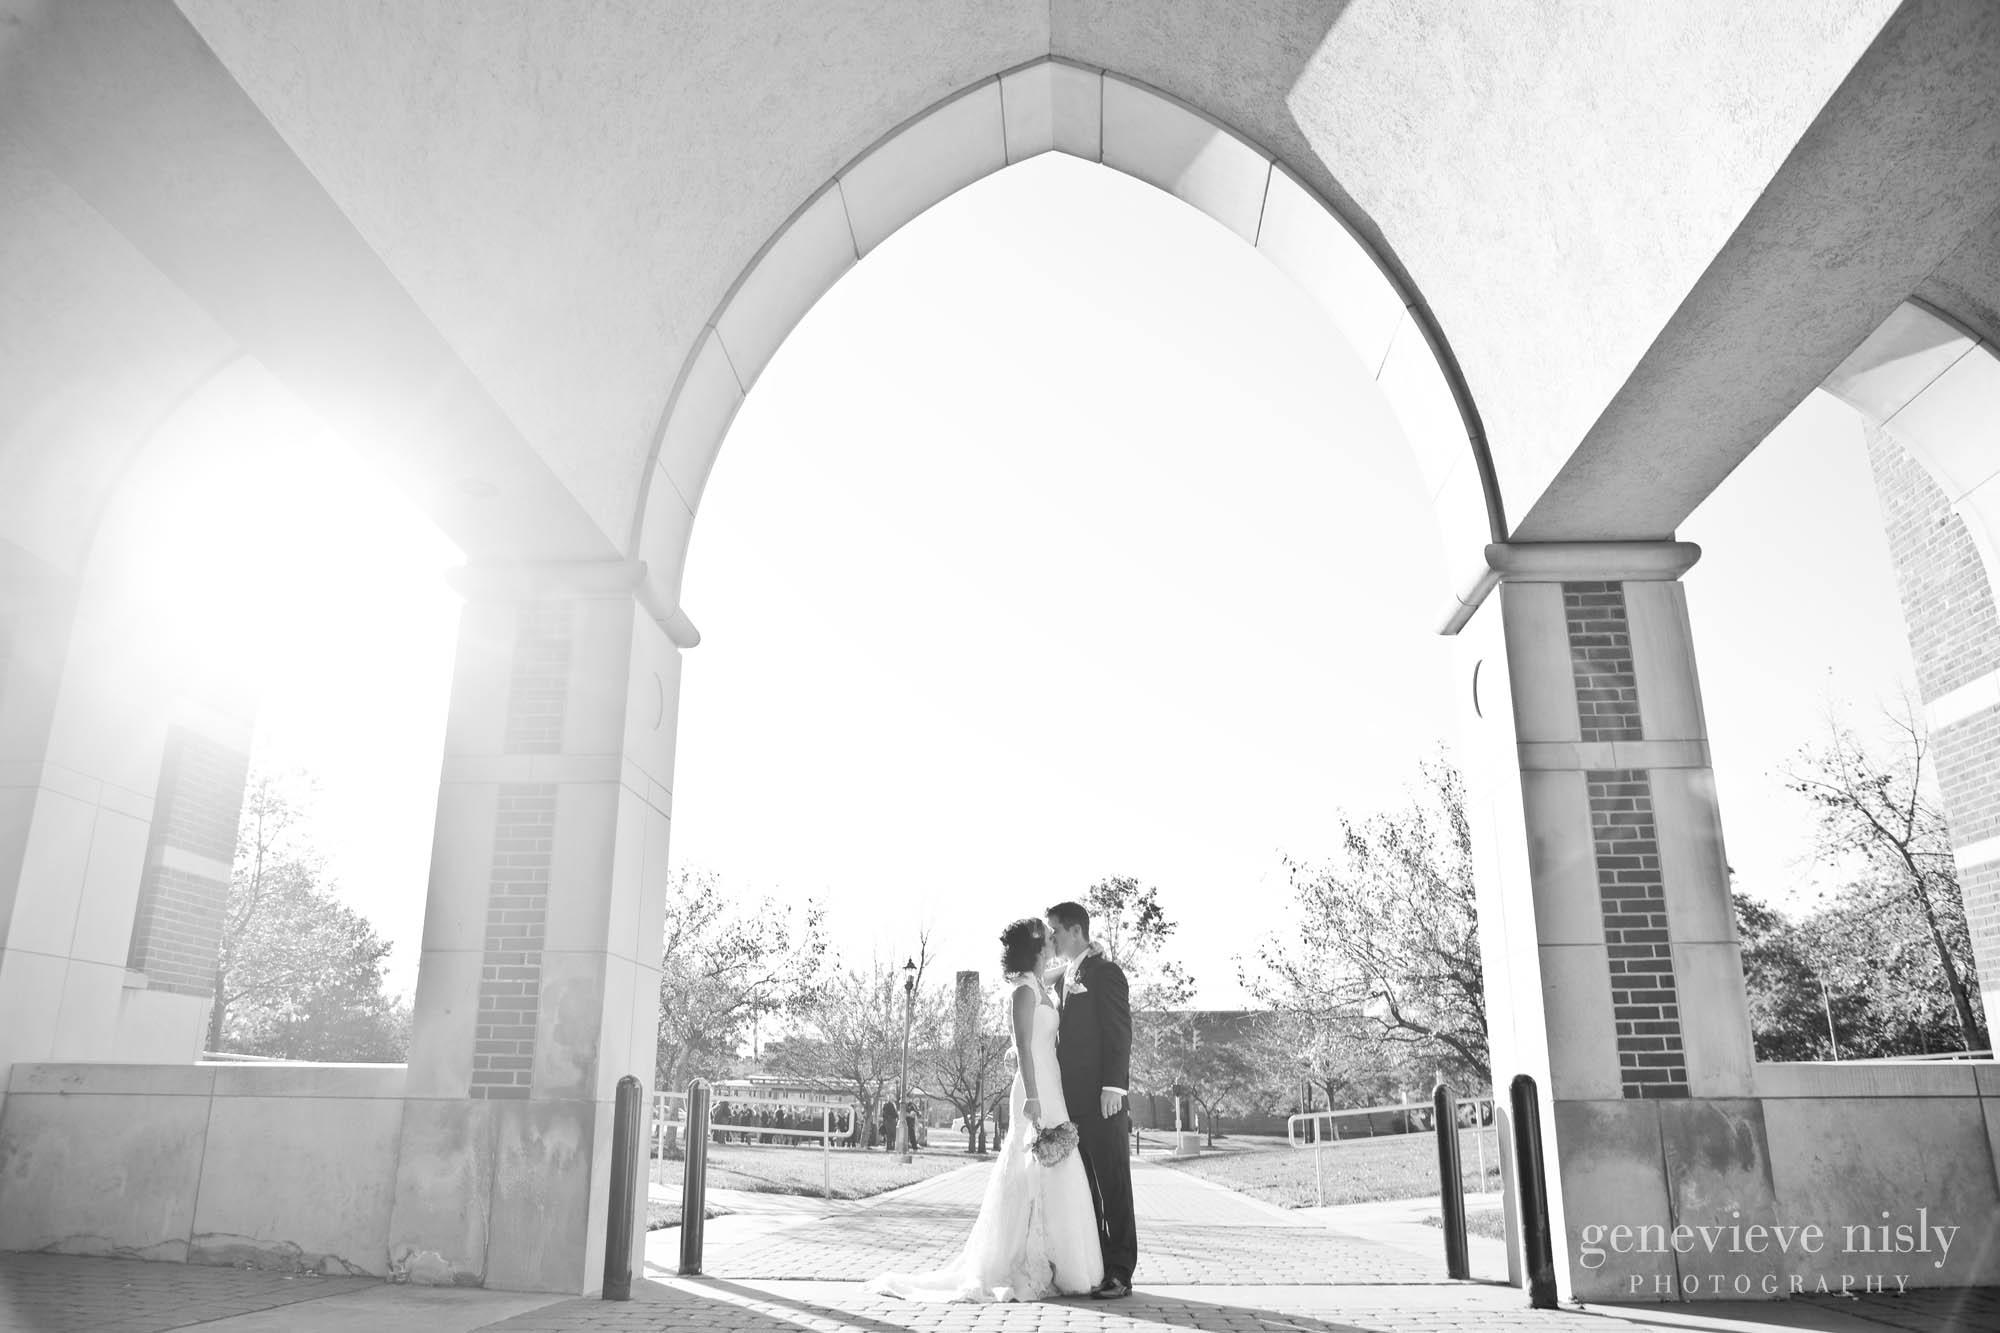 Brian & Erin - Cleveland Wedding Photographers - Genevieve Nisly ...